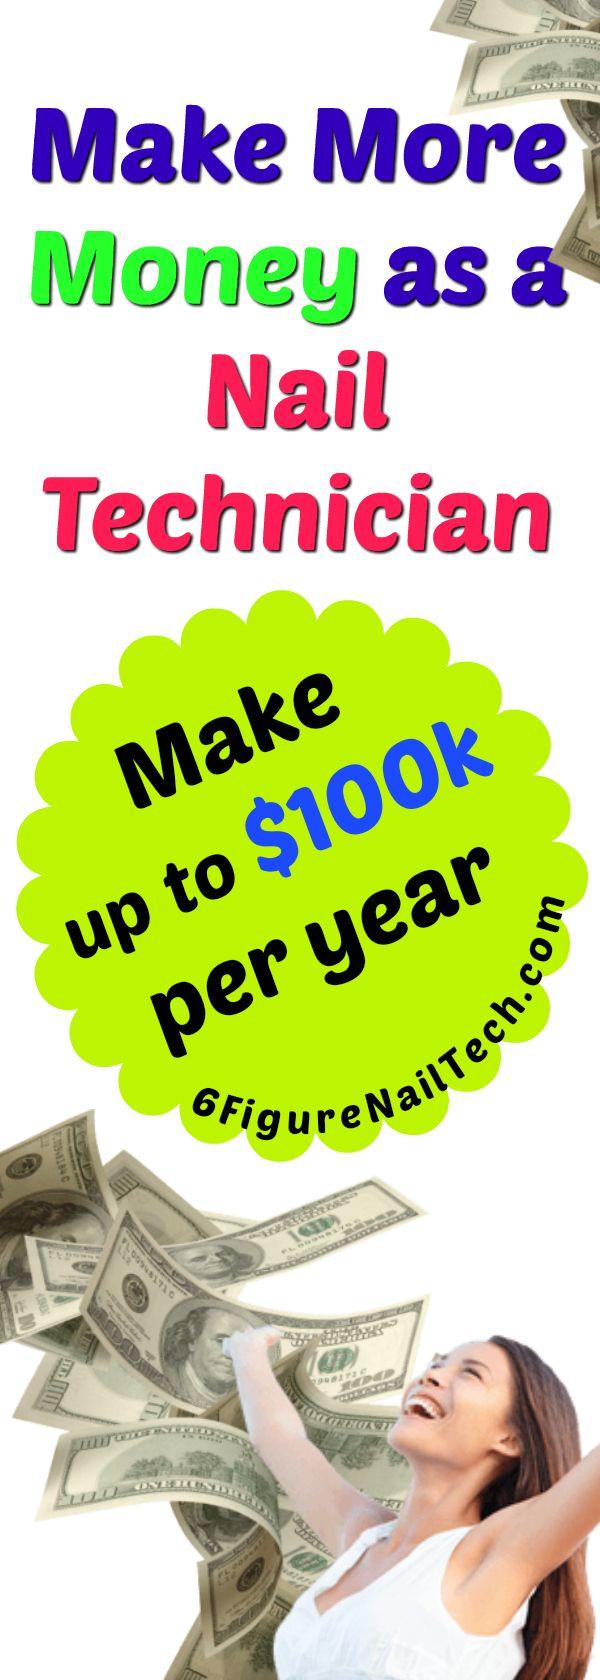 Make more money as a nail technician. Business marketing